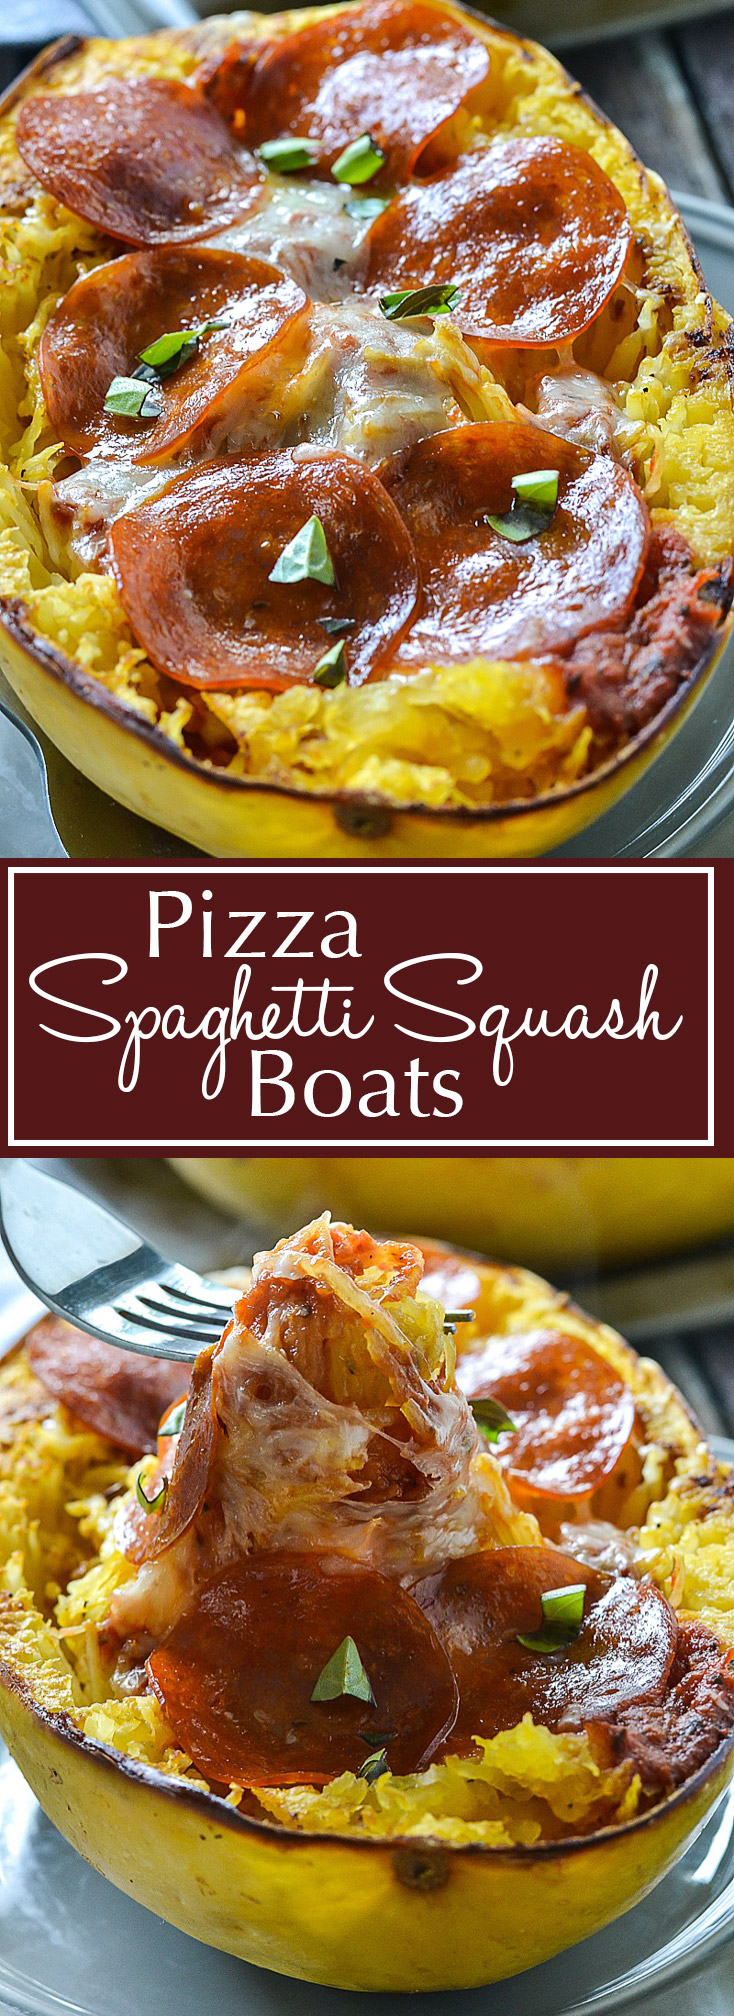 Pizza Spaghetti Squash Boats | www.motherthyme.com